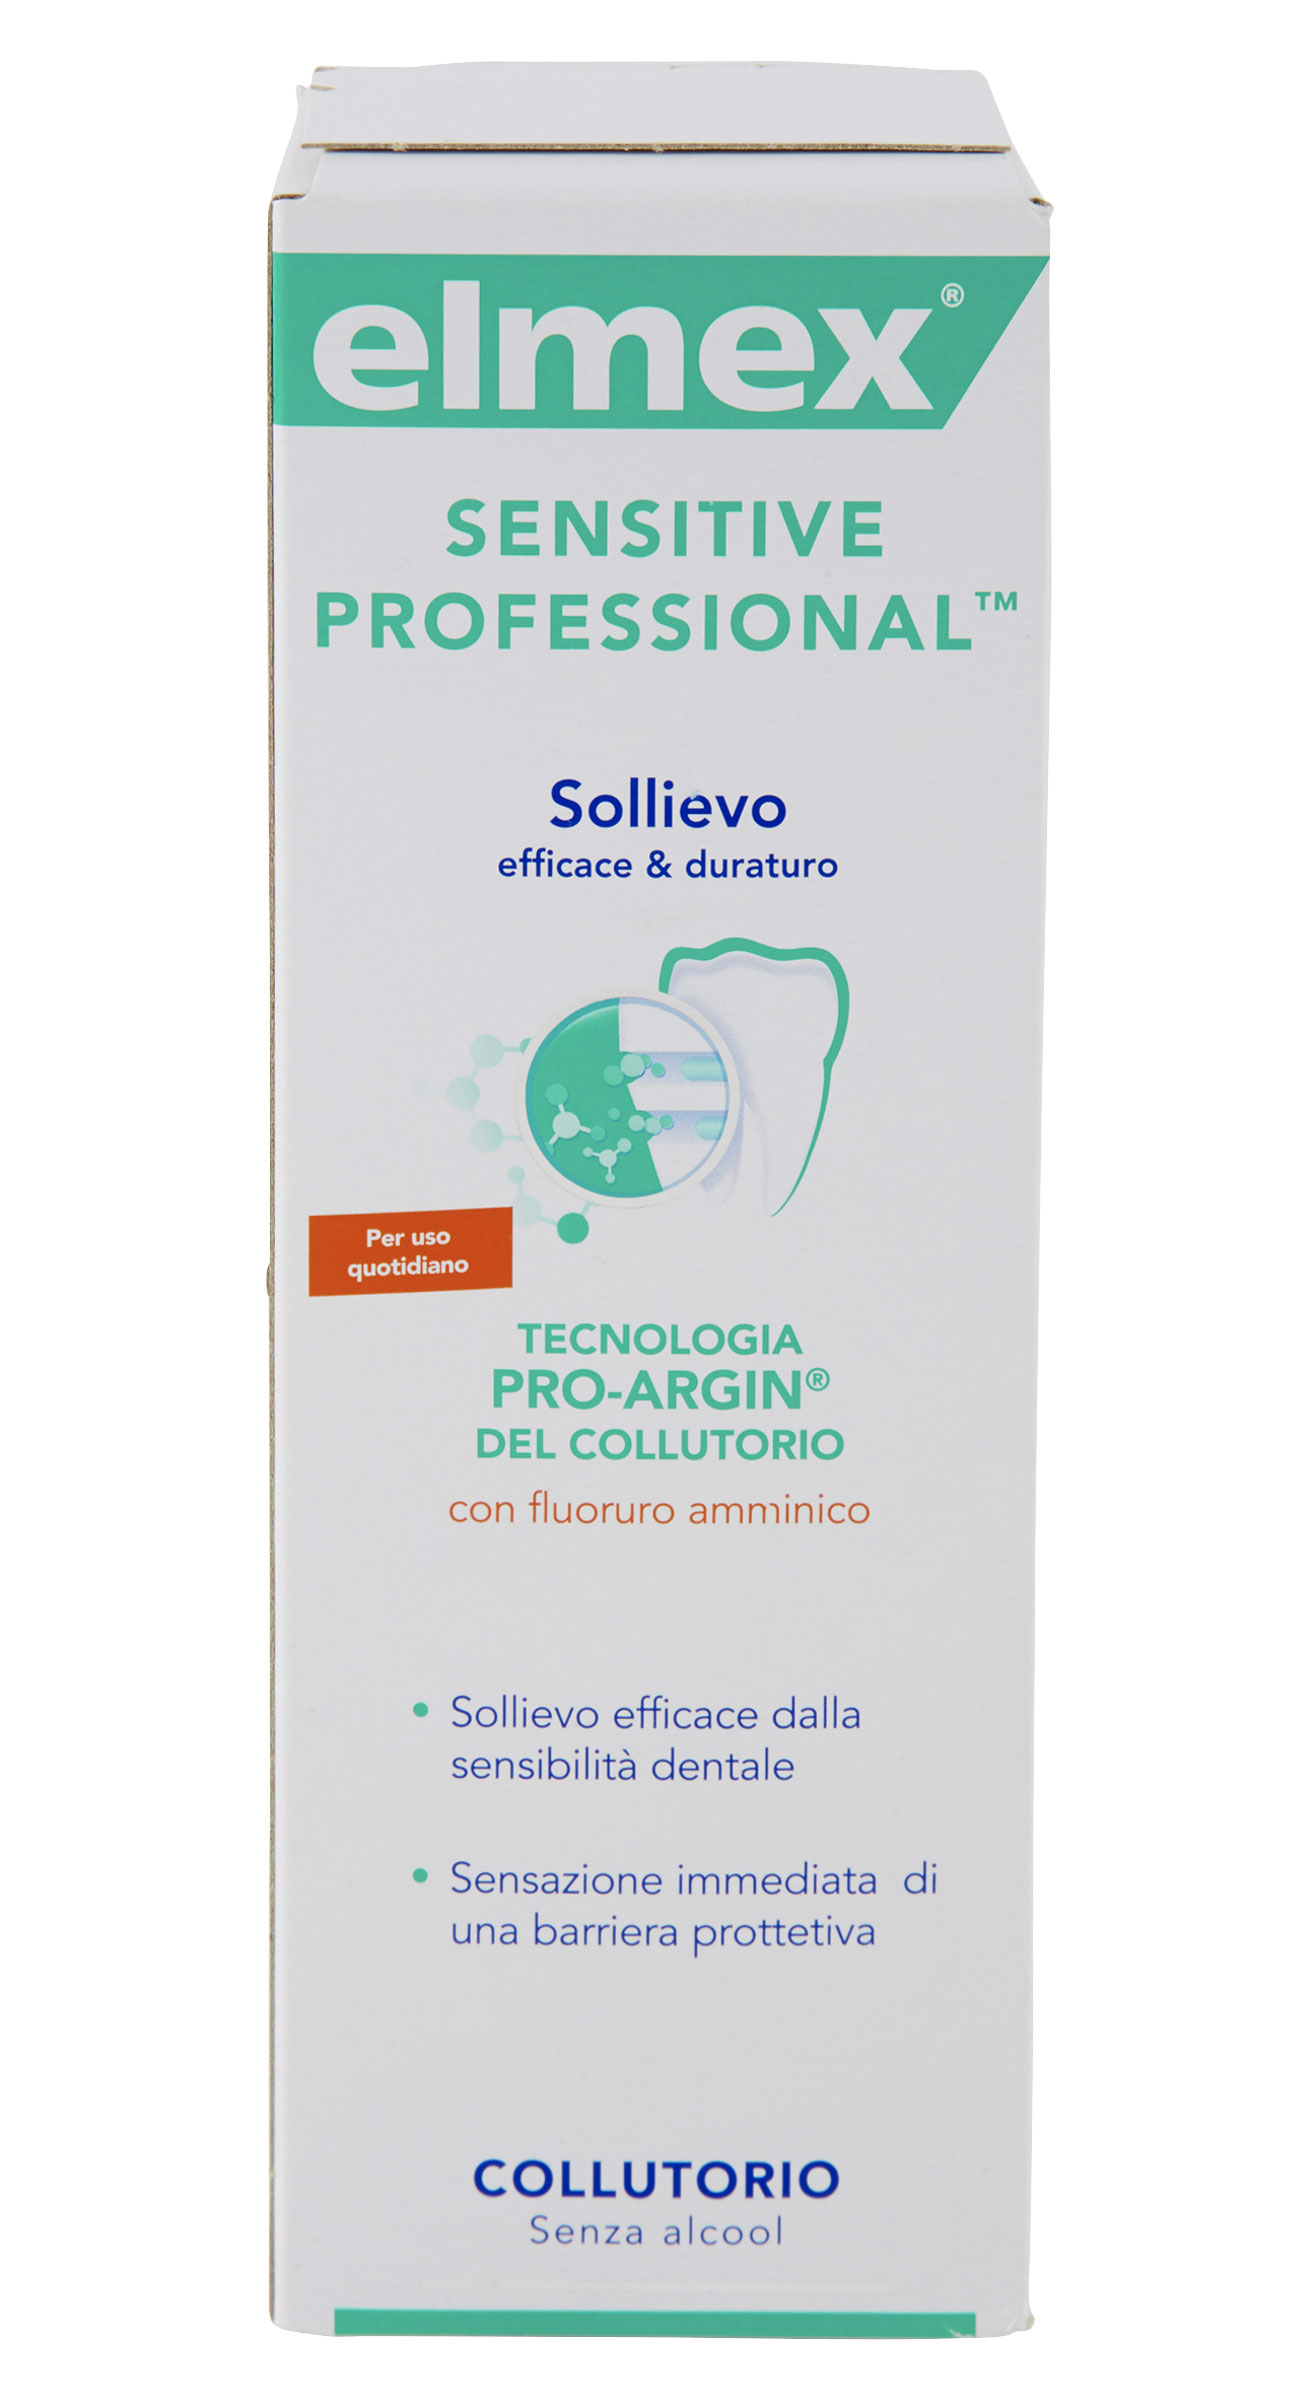 Elmex Sensitive Professional Collutorio 400ml